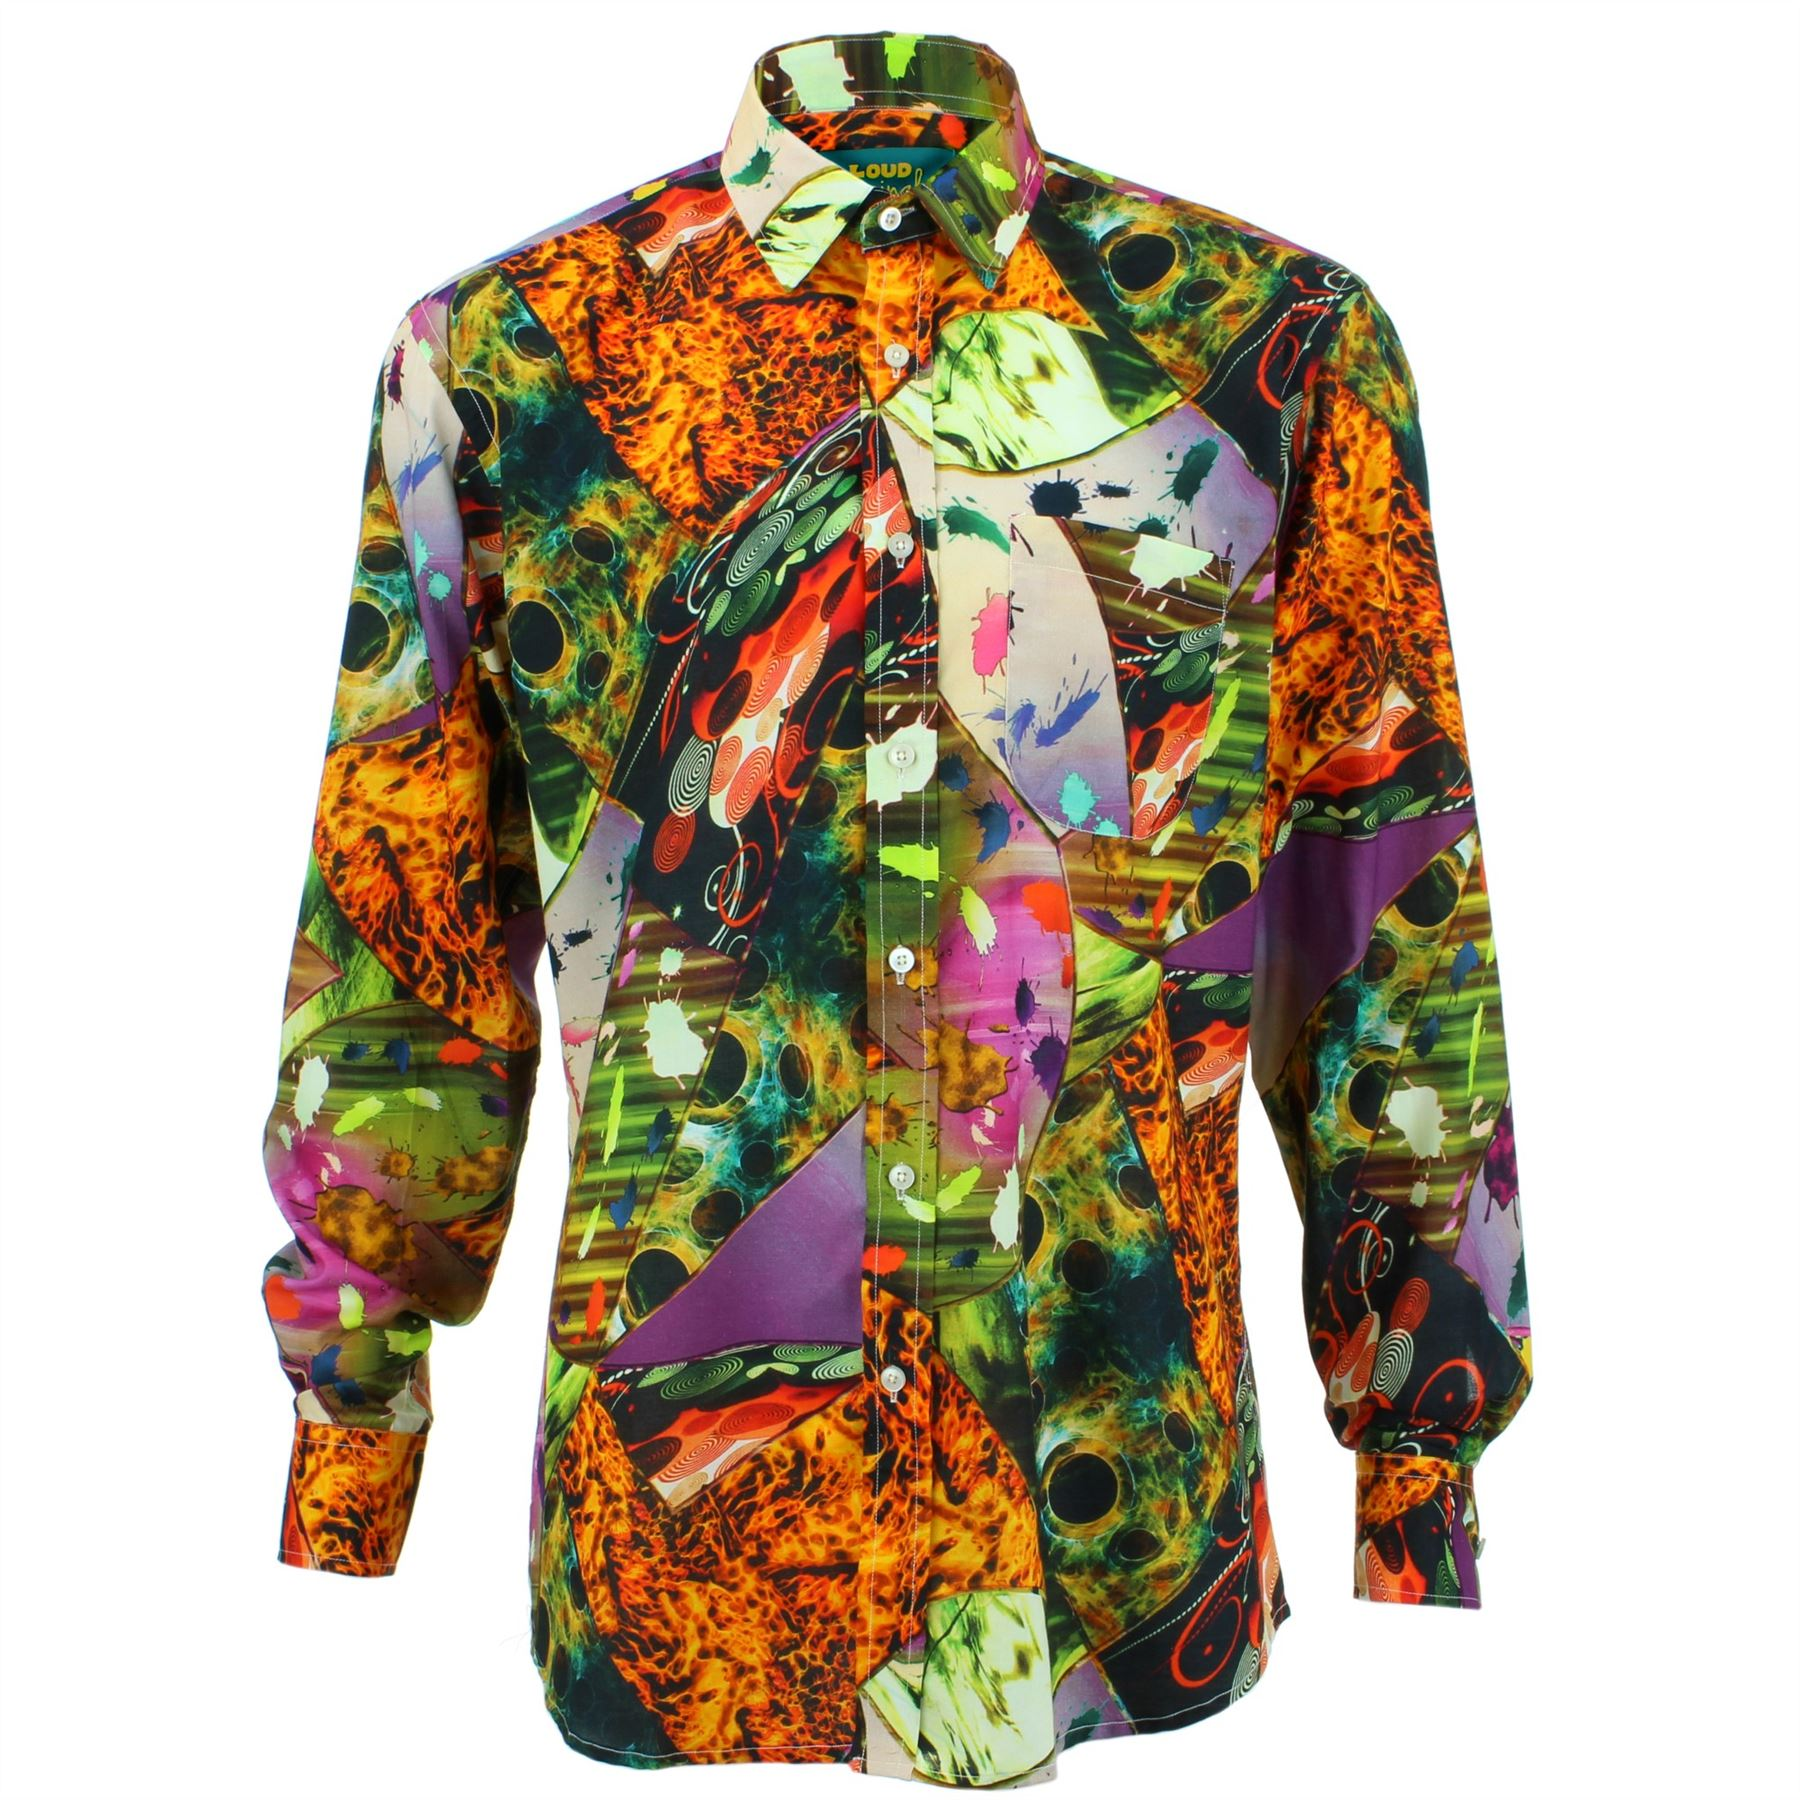 vendita calda online 5da33 bf7ed Dettagli su Uomo Loud Camicia Regular Fiamme Arancione Rétro Psichedelico  Stravagante